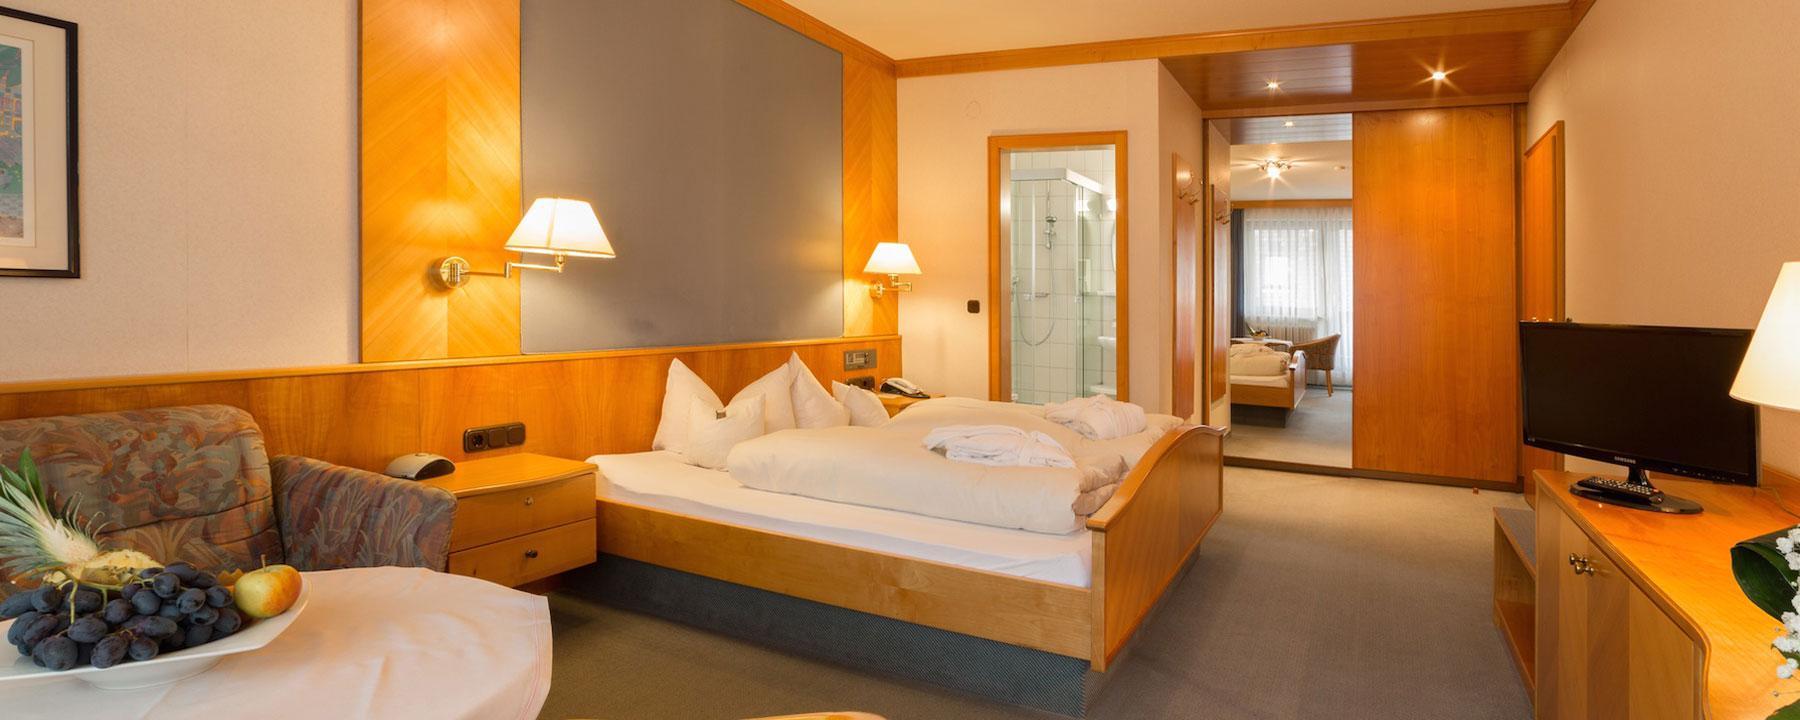 Foto de Hotel Bayernwinkel - Yoga & Ayurveda Bad Wörishofen